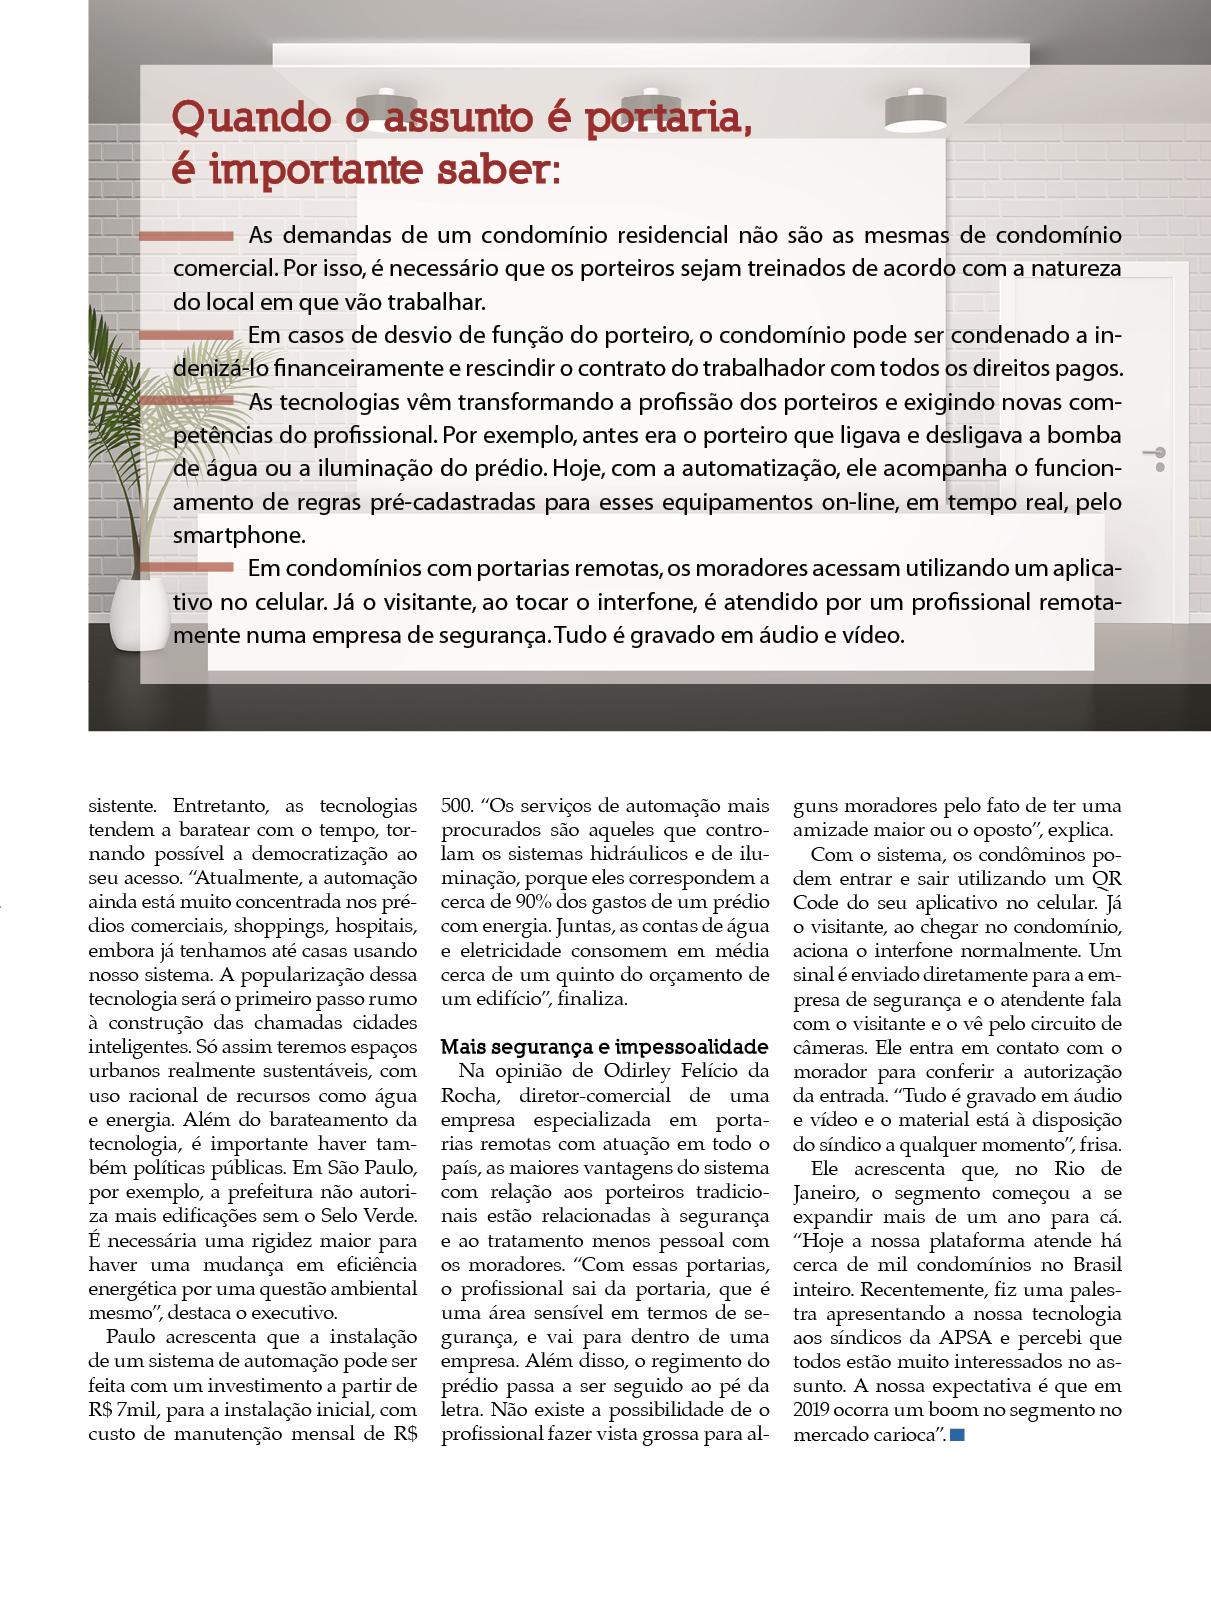 Revista Síndico_ed24423